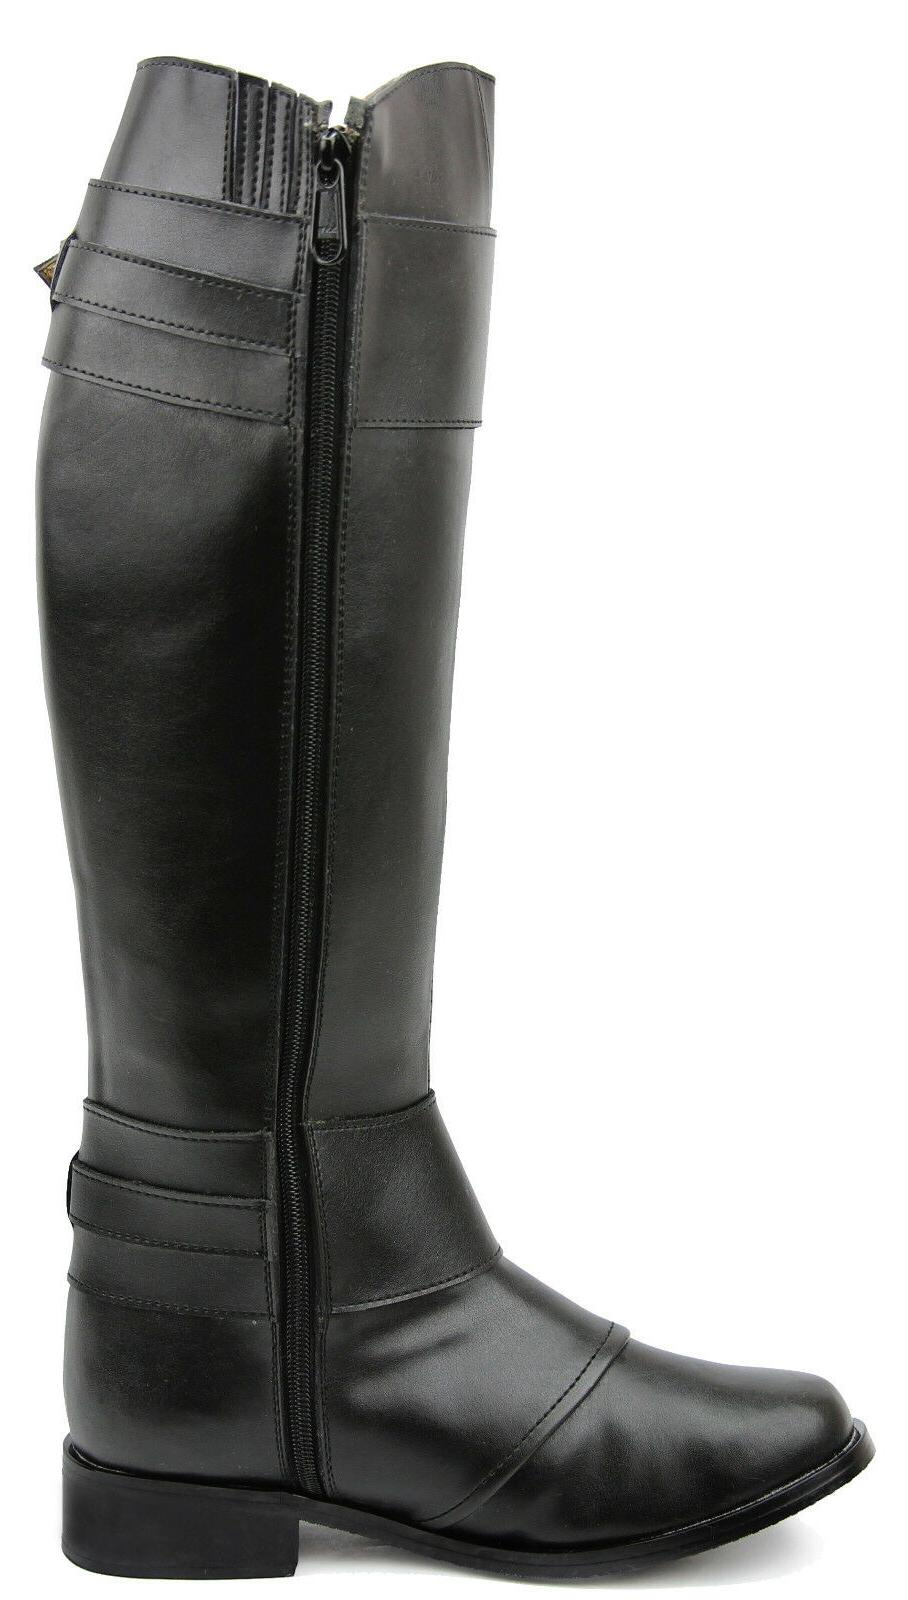 FAMMZ Women Fashion Tall Boots